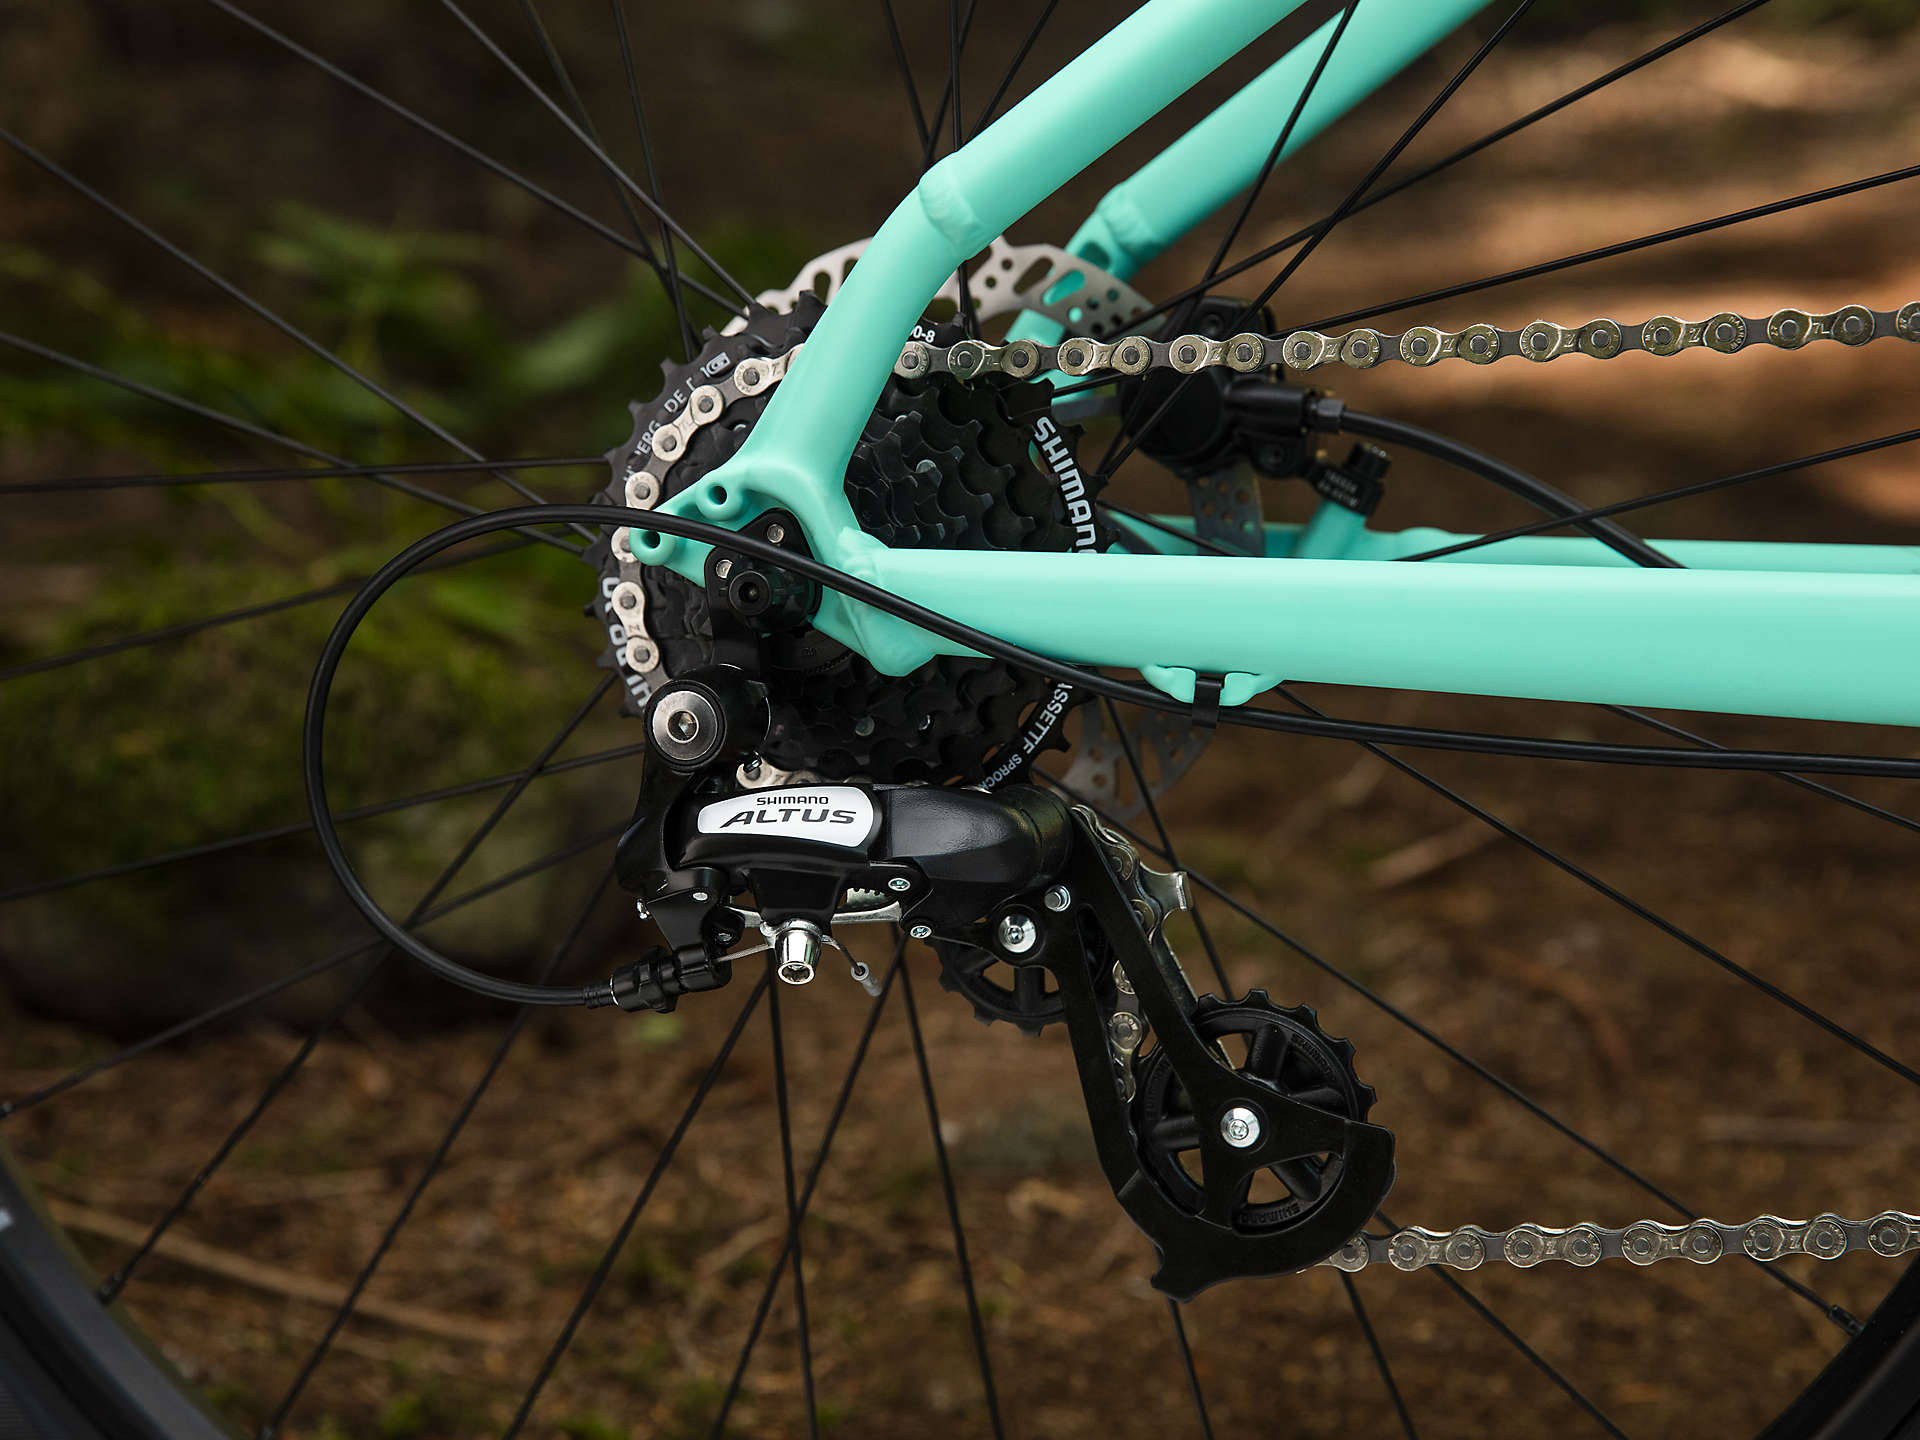 Bicicleta Trek Marlin 6 Feminina - R$3.499,00